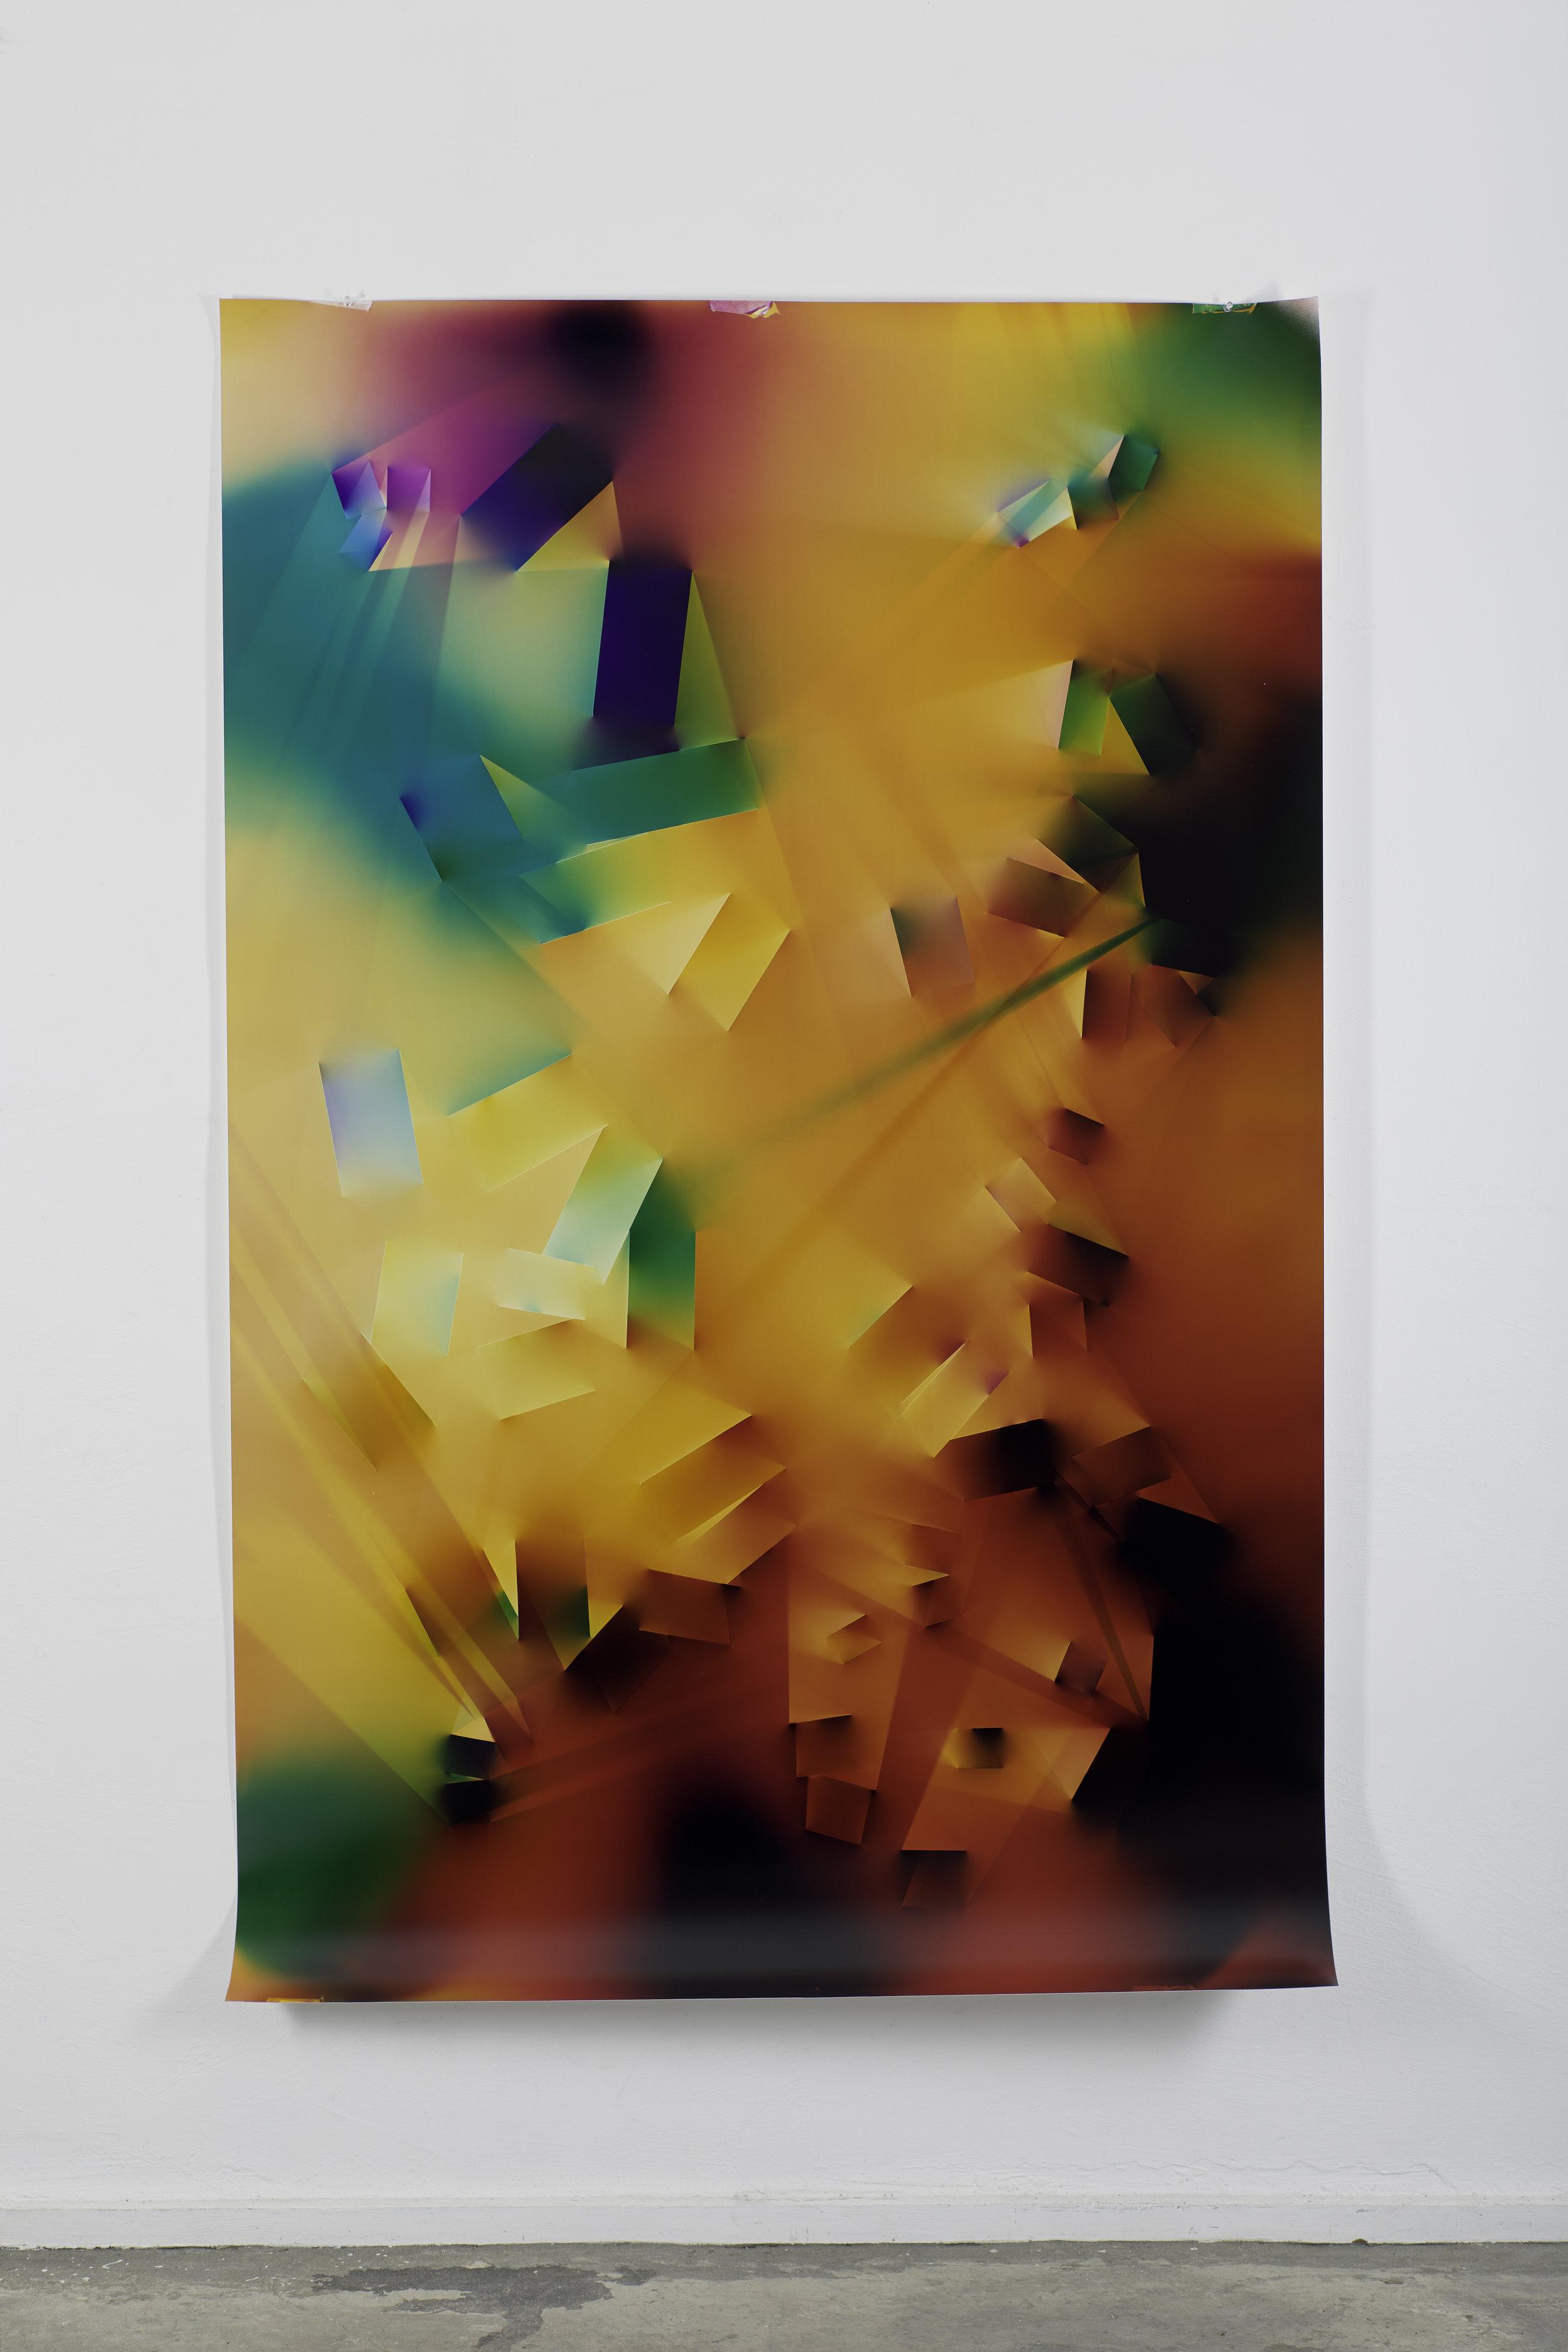 Natalja Kent Group Study Movement Artifacts Unusual Colors 3